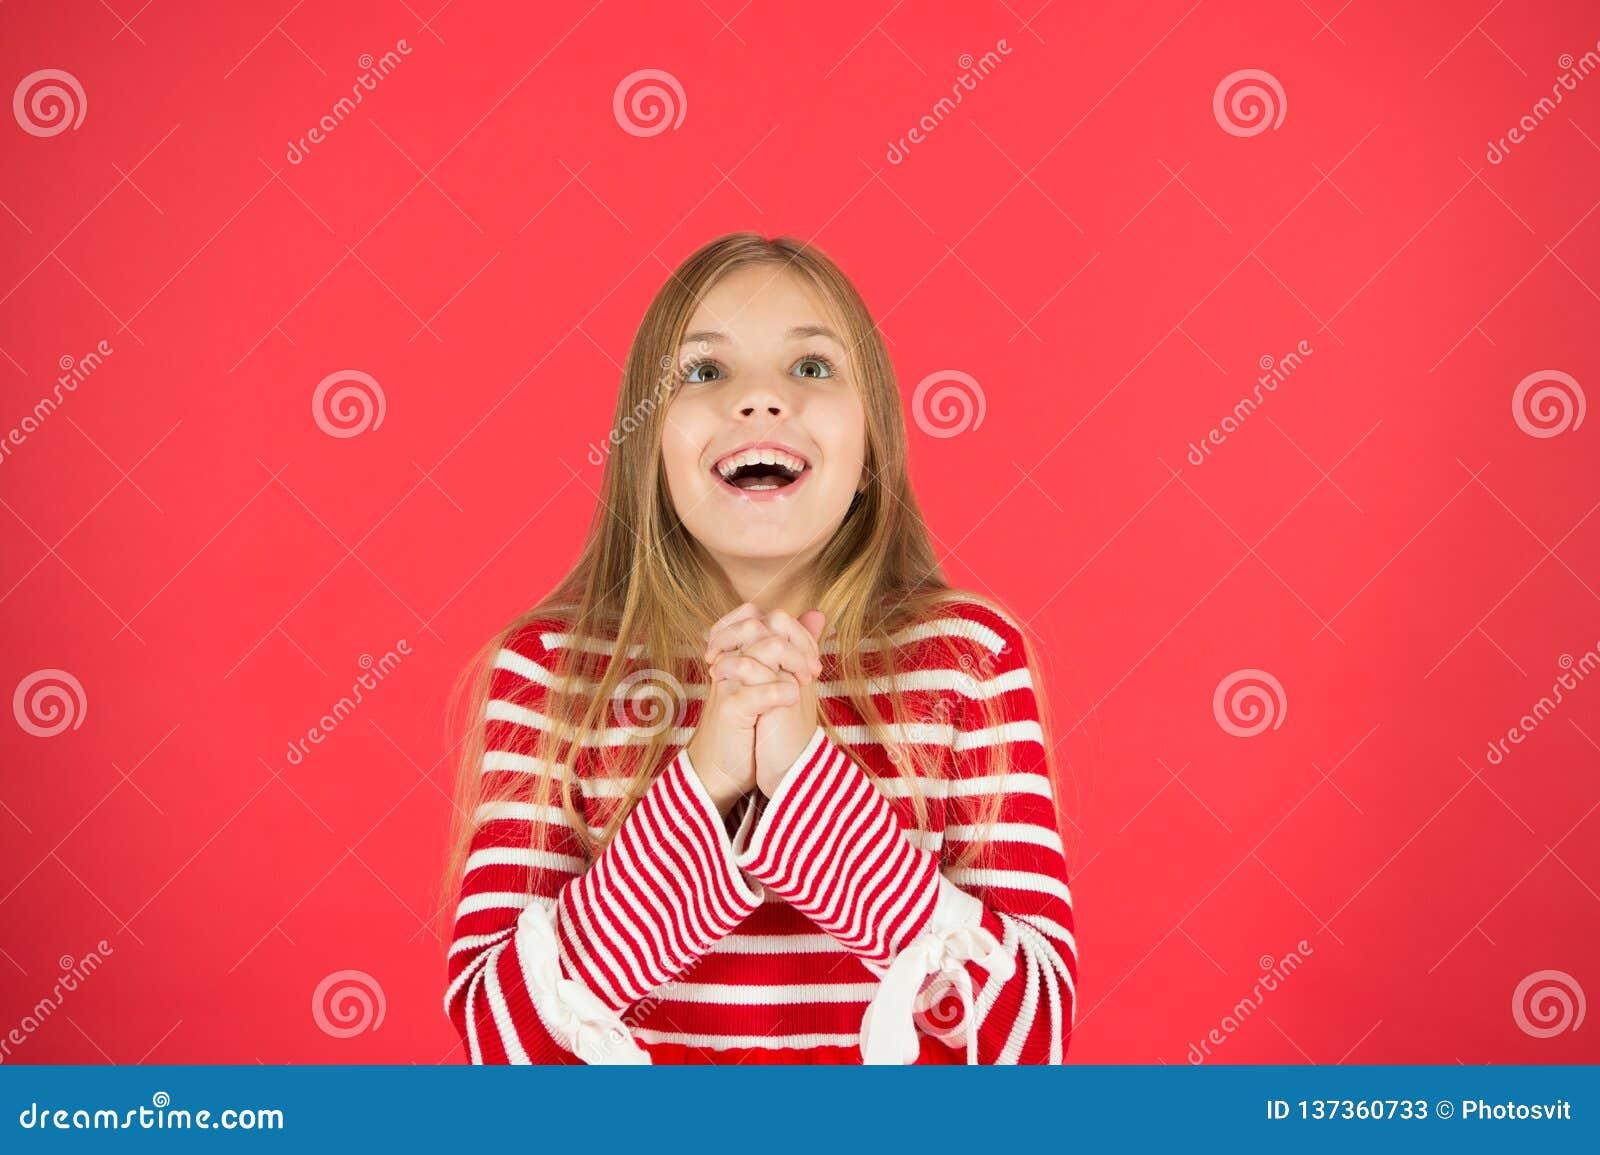 Maak een wens Hoop voor het beste Meisjes hoopvolle opgewekte gezicht die wens maken Geloof in mirakel Kindmeisje die haar wens d